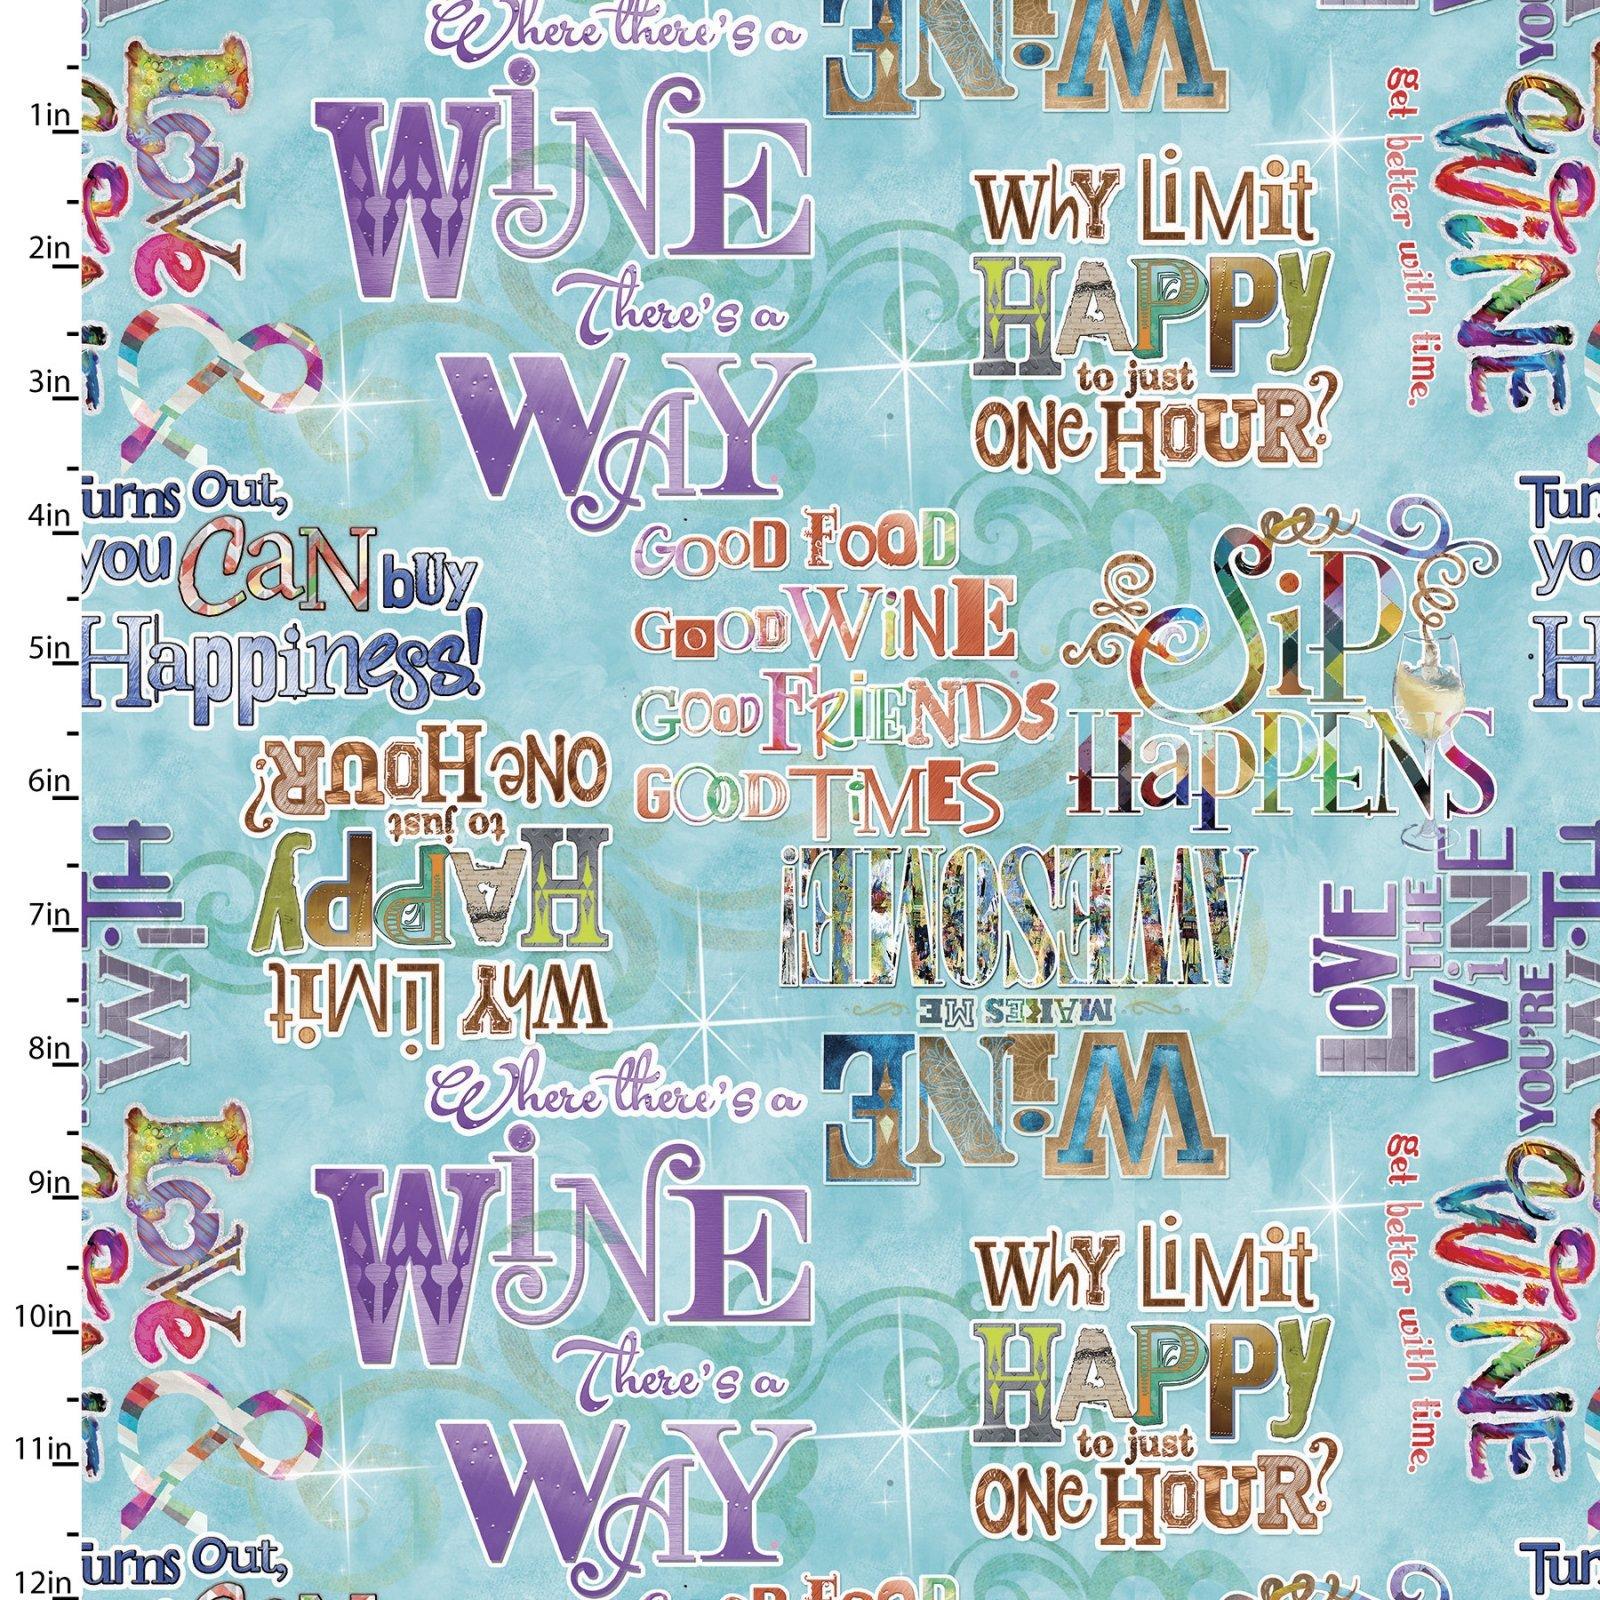 Sip & Snip Wine 14910 Words